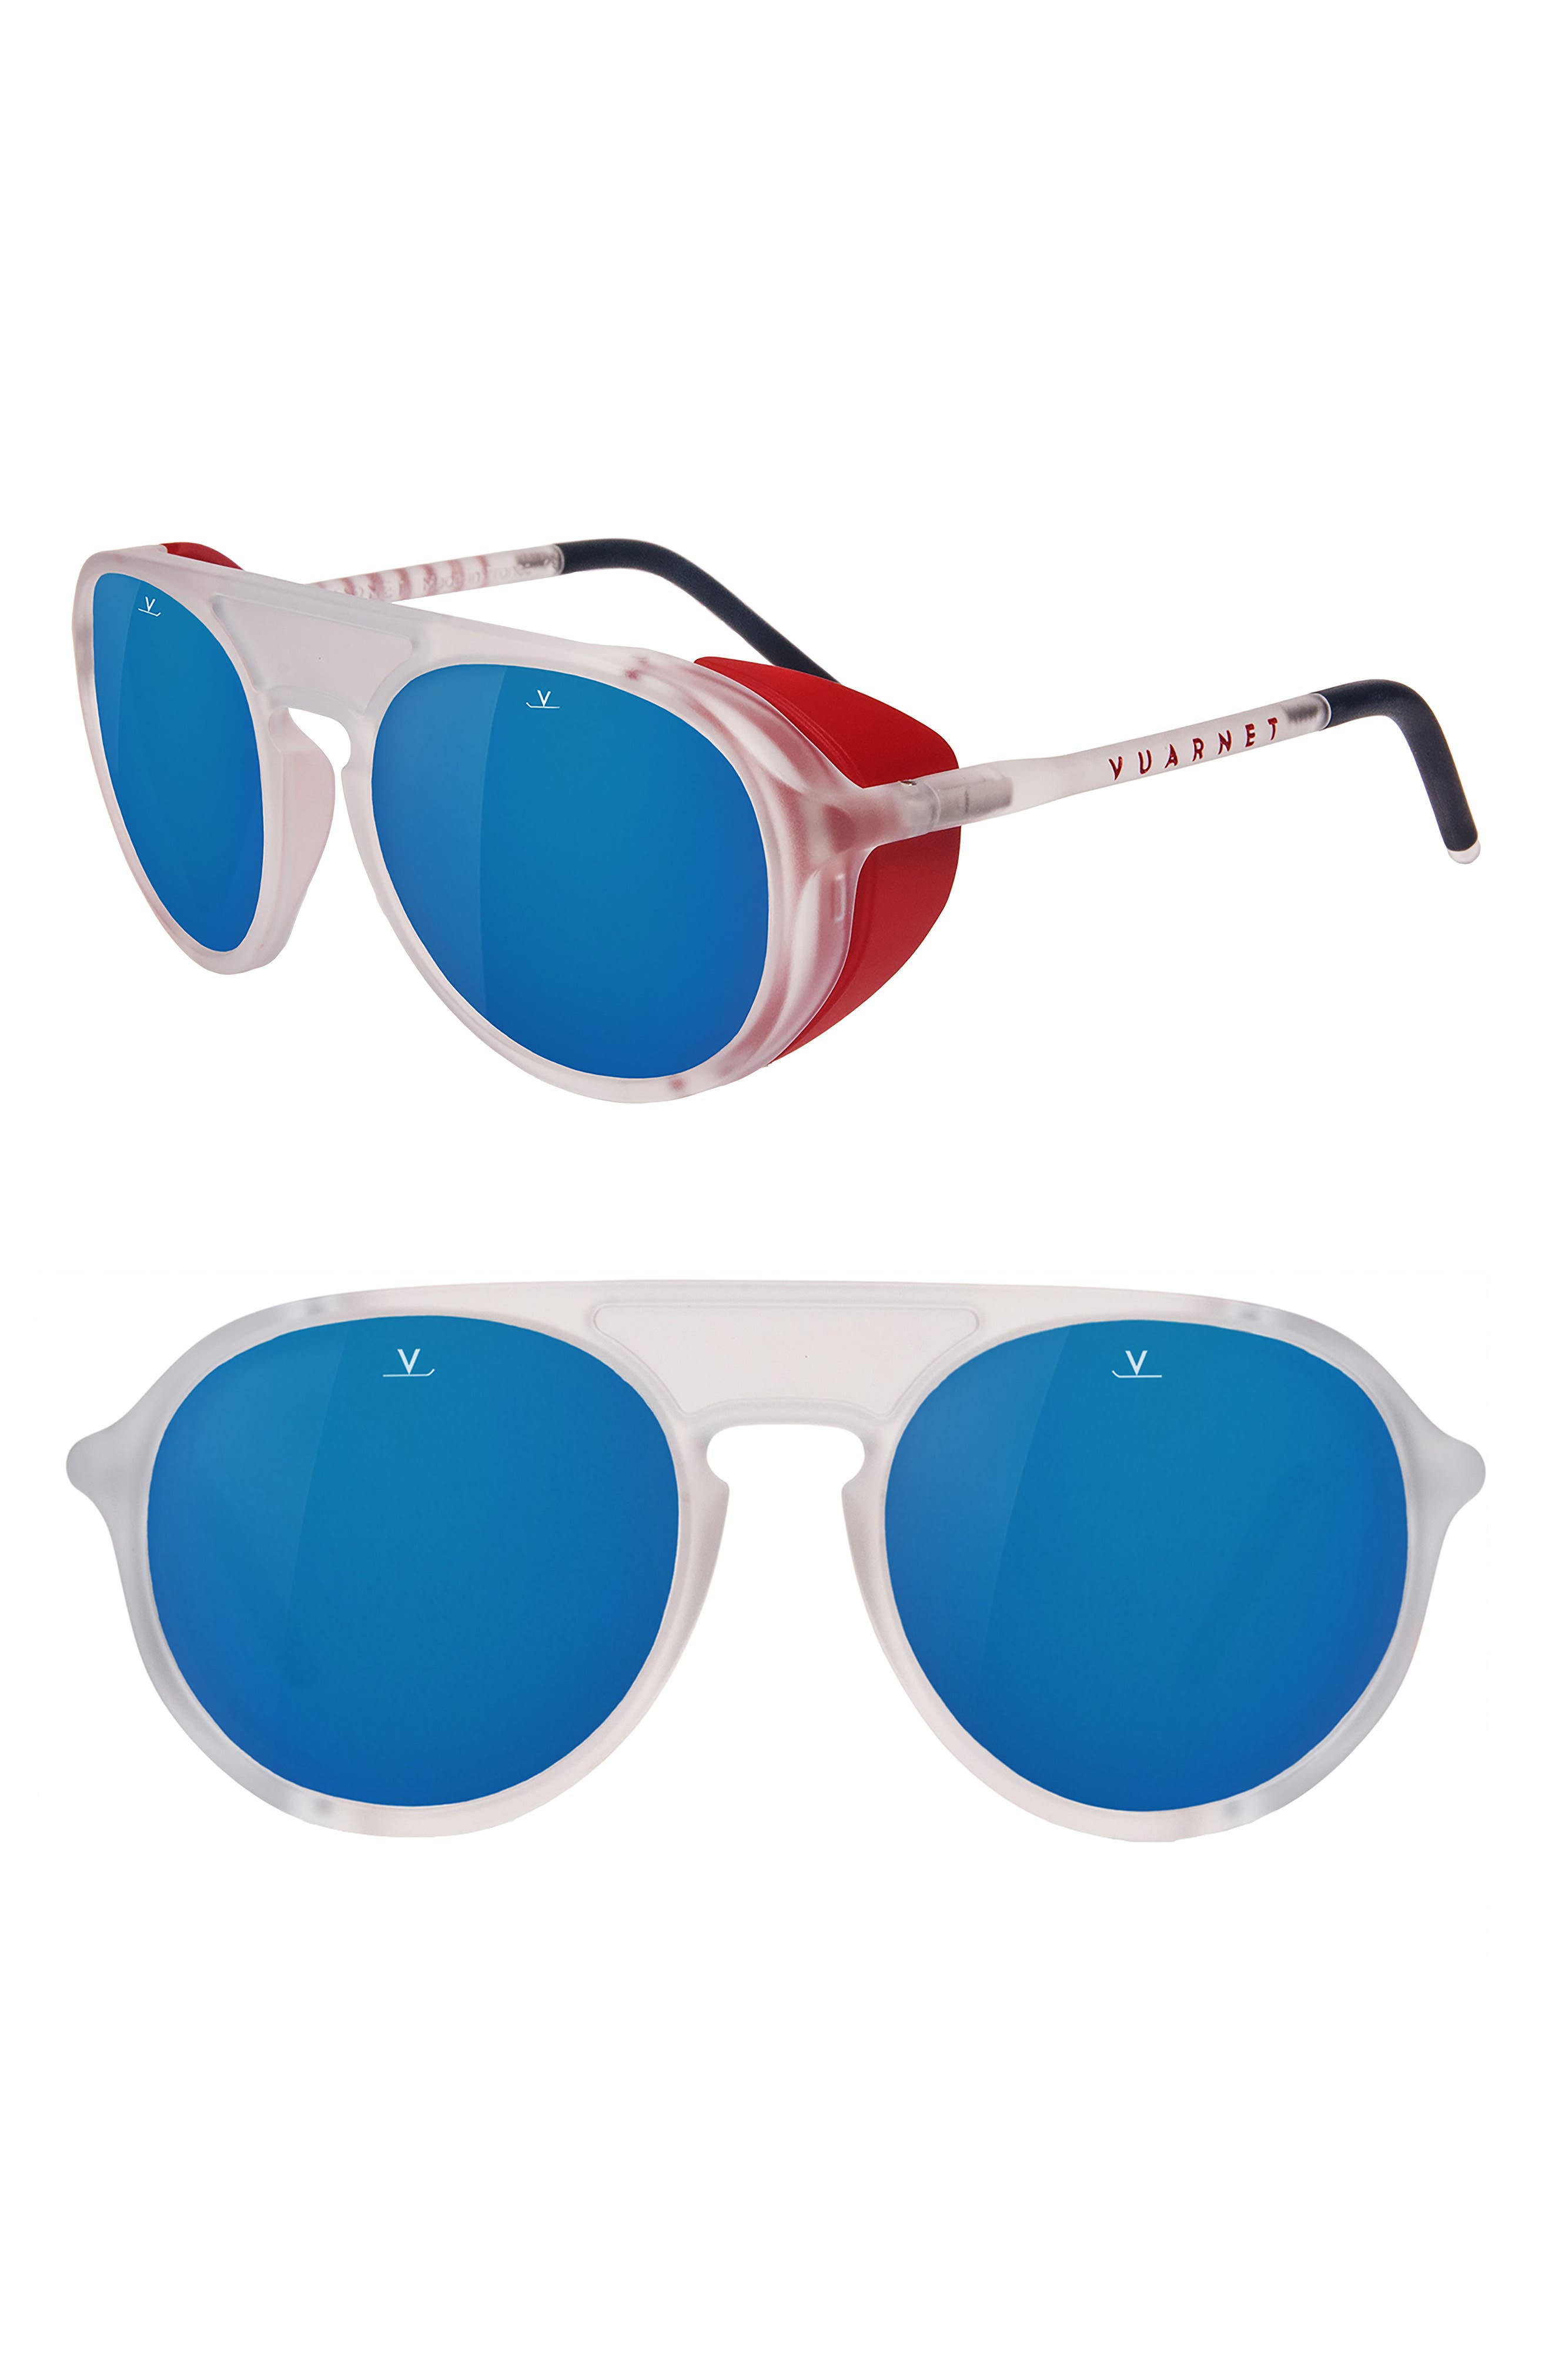 Main Image - Vuarnet Ice 51mm Polarized Aviator Sunglasses